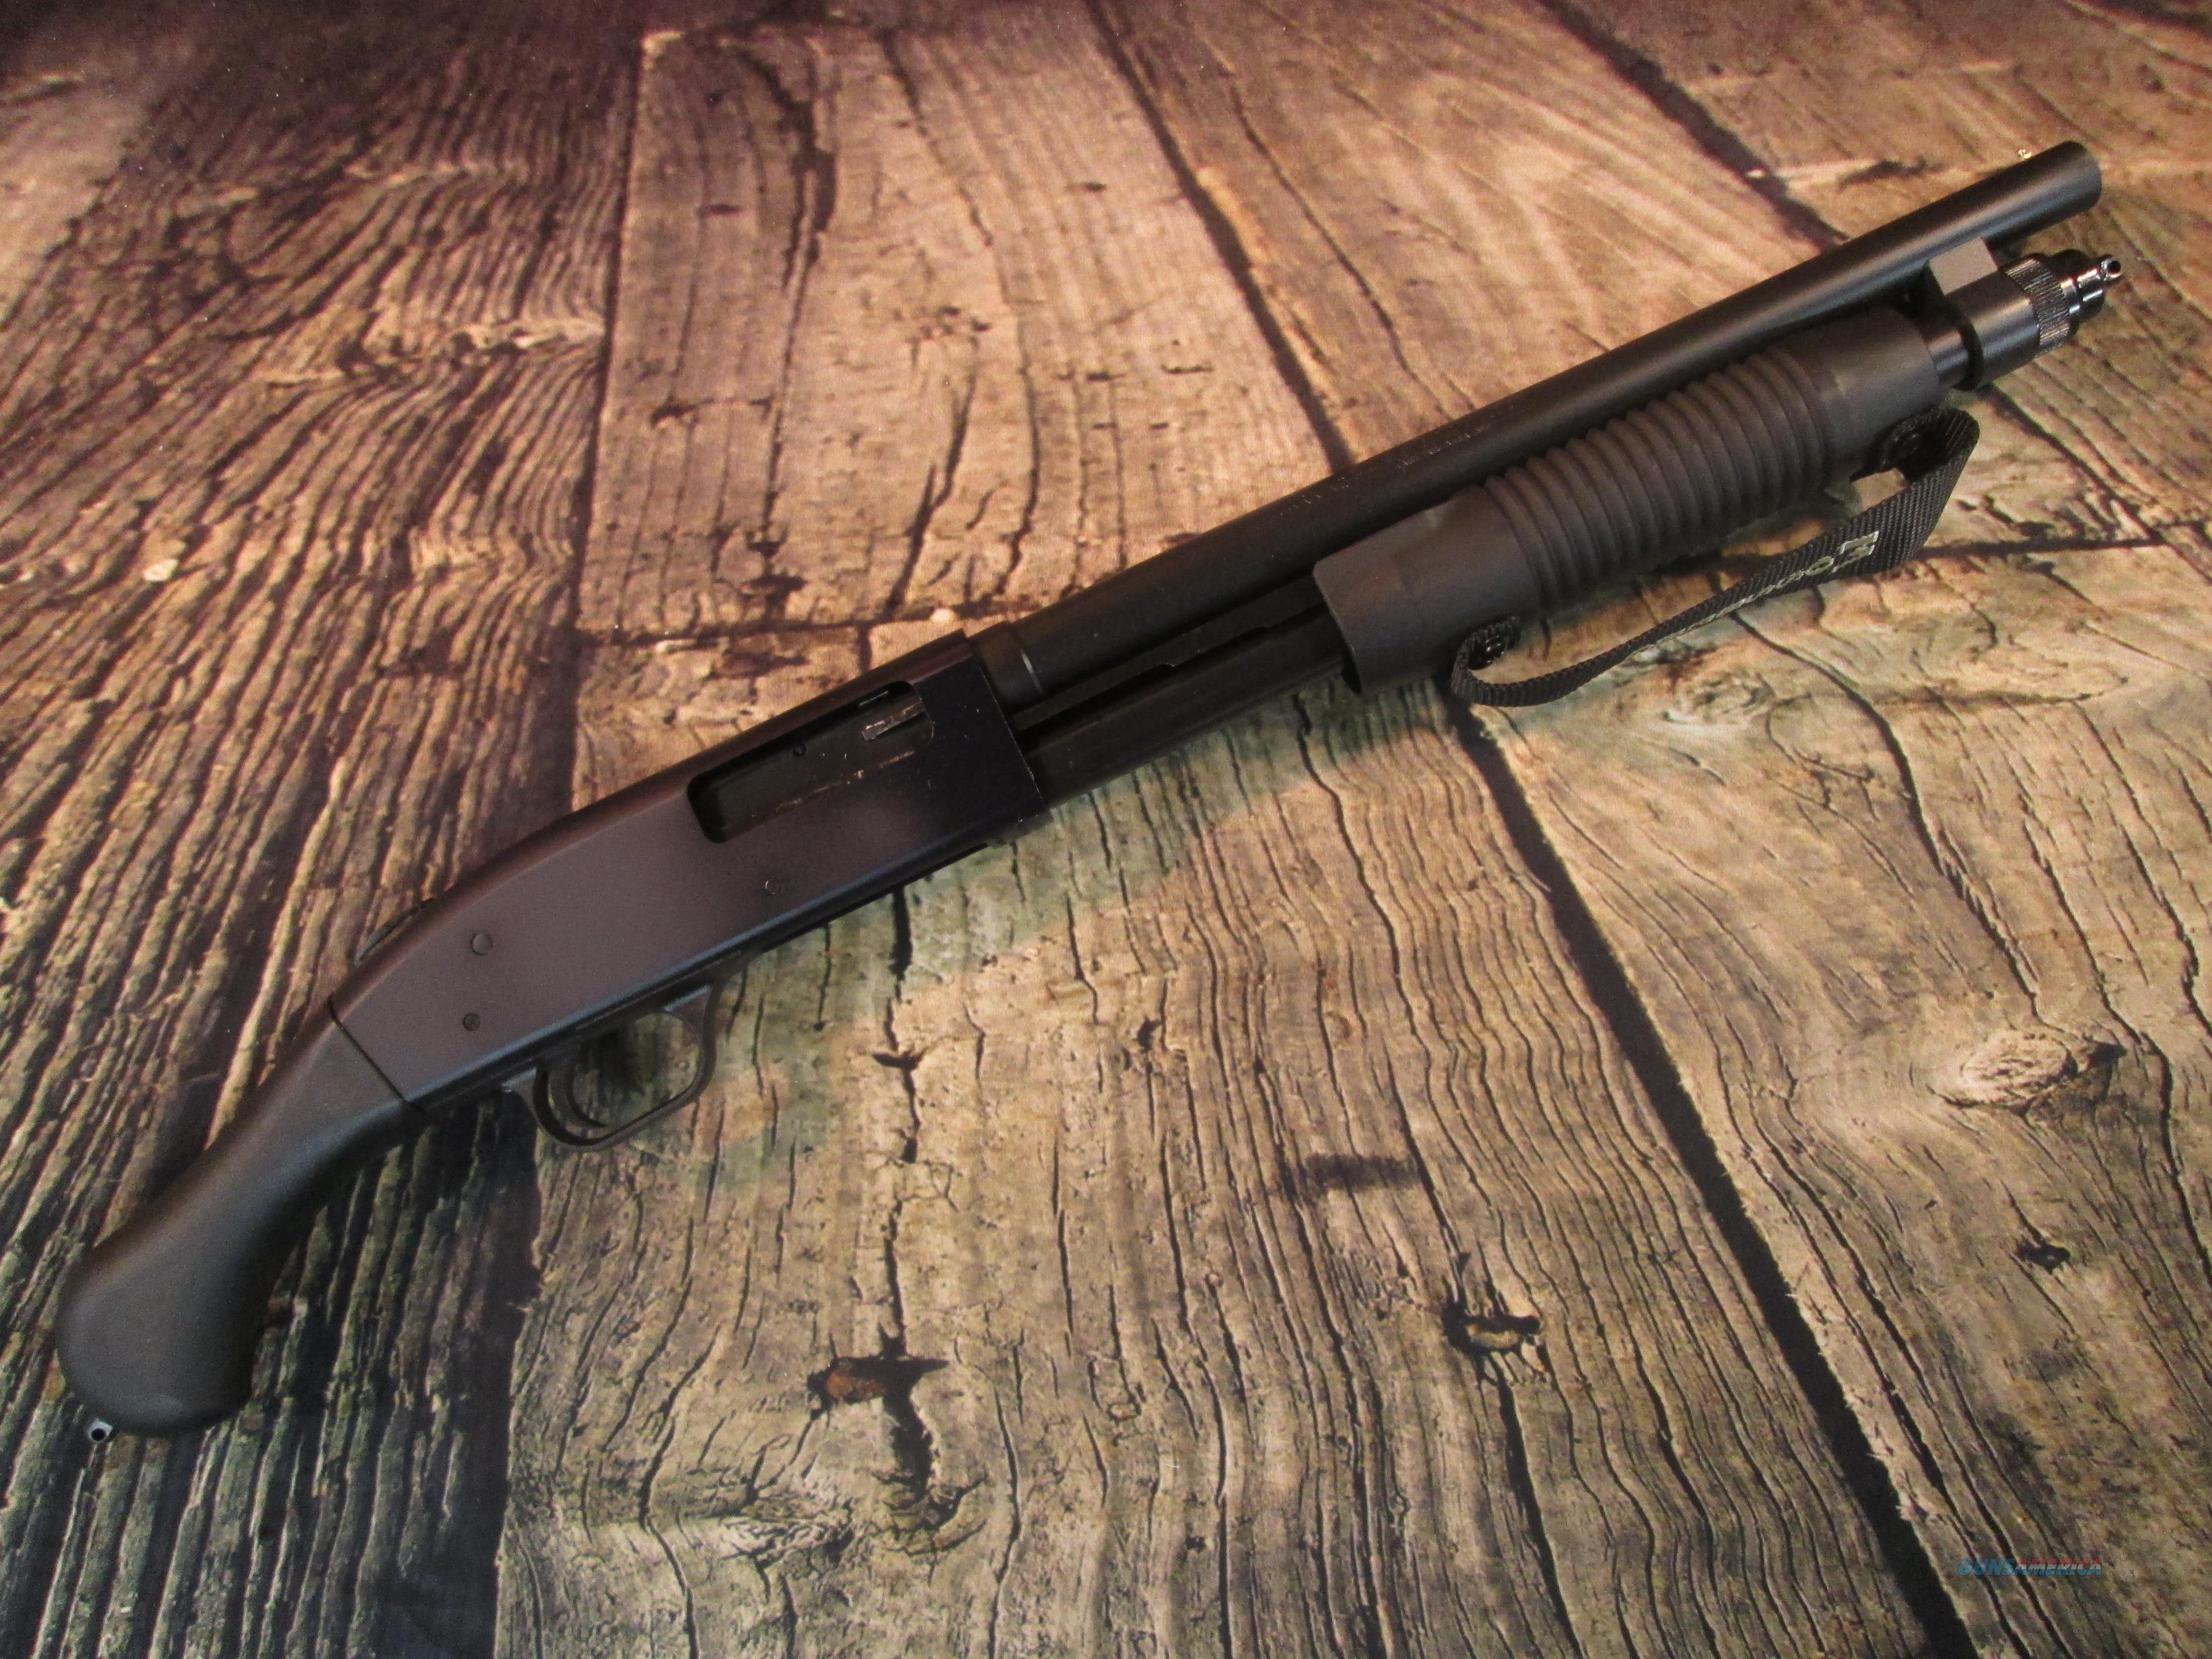 MOSSBERG 590 SHOCKWAVE 20 GAUGE NEW (50657)  Guns > Shotguns > Mossberg Shotguns > Pump > Tactical